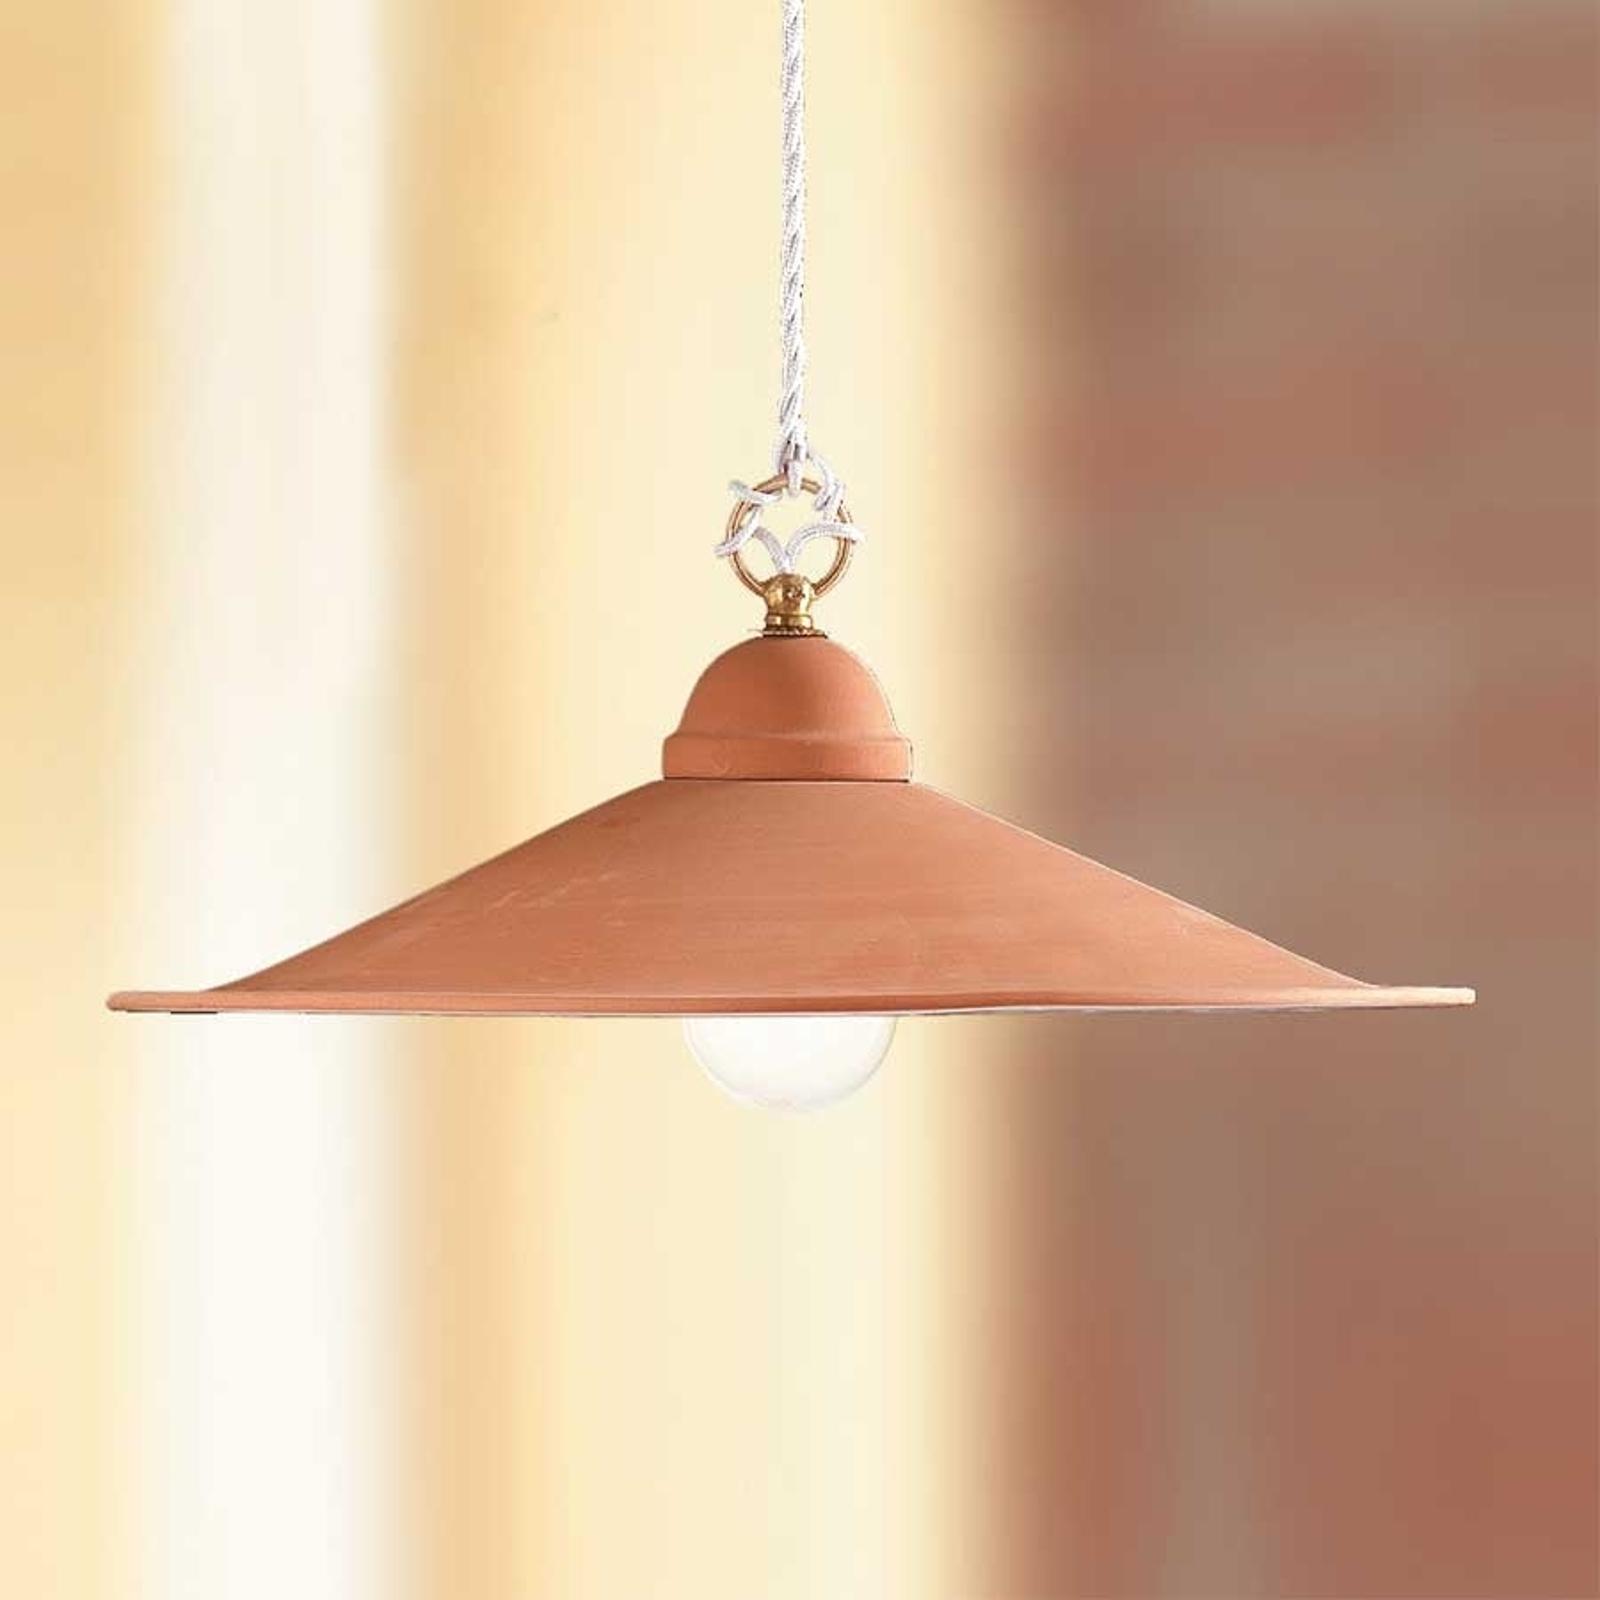 Lámpara colgante GIULIA, pantalla cerámica 28 cm